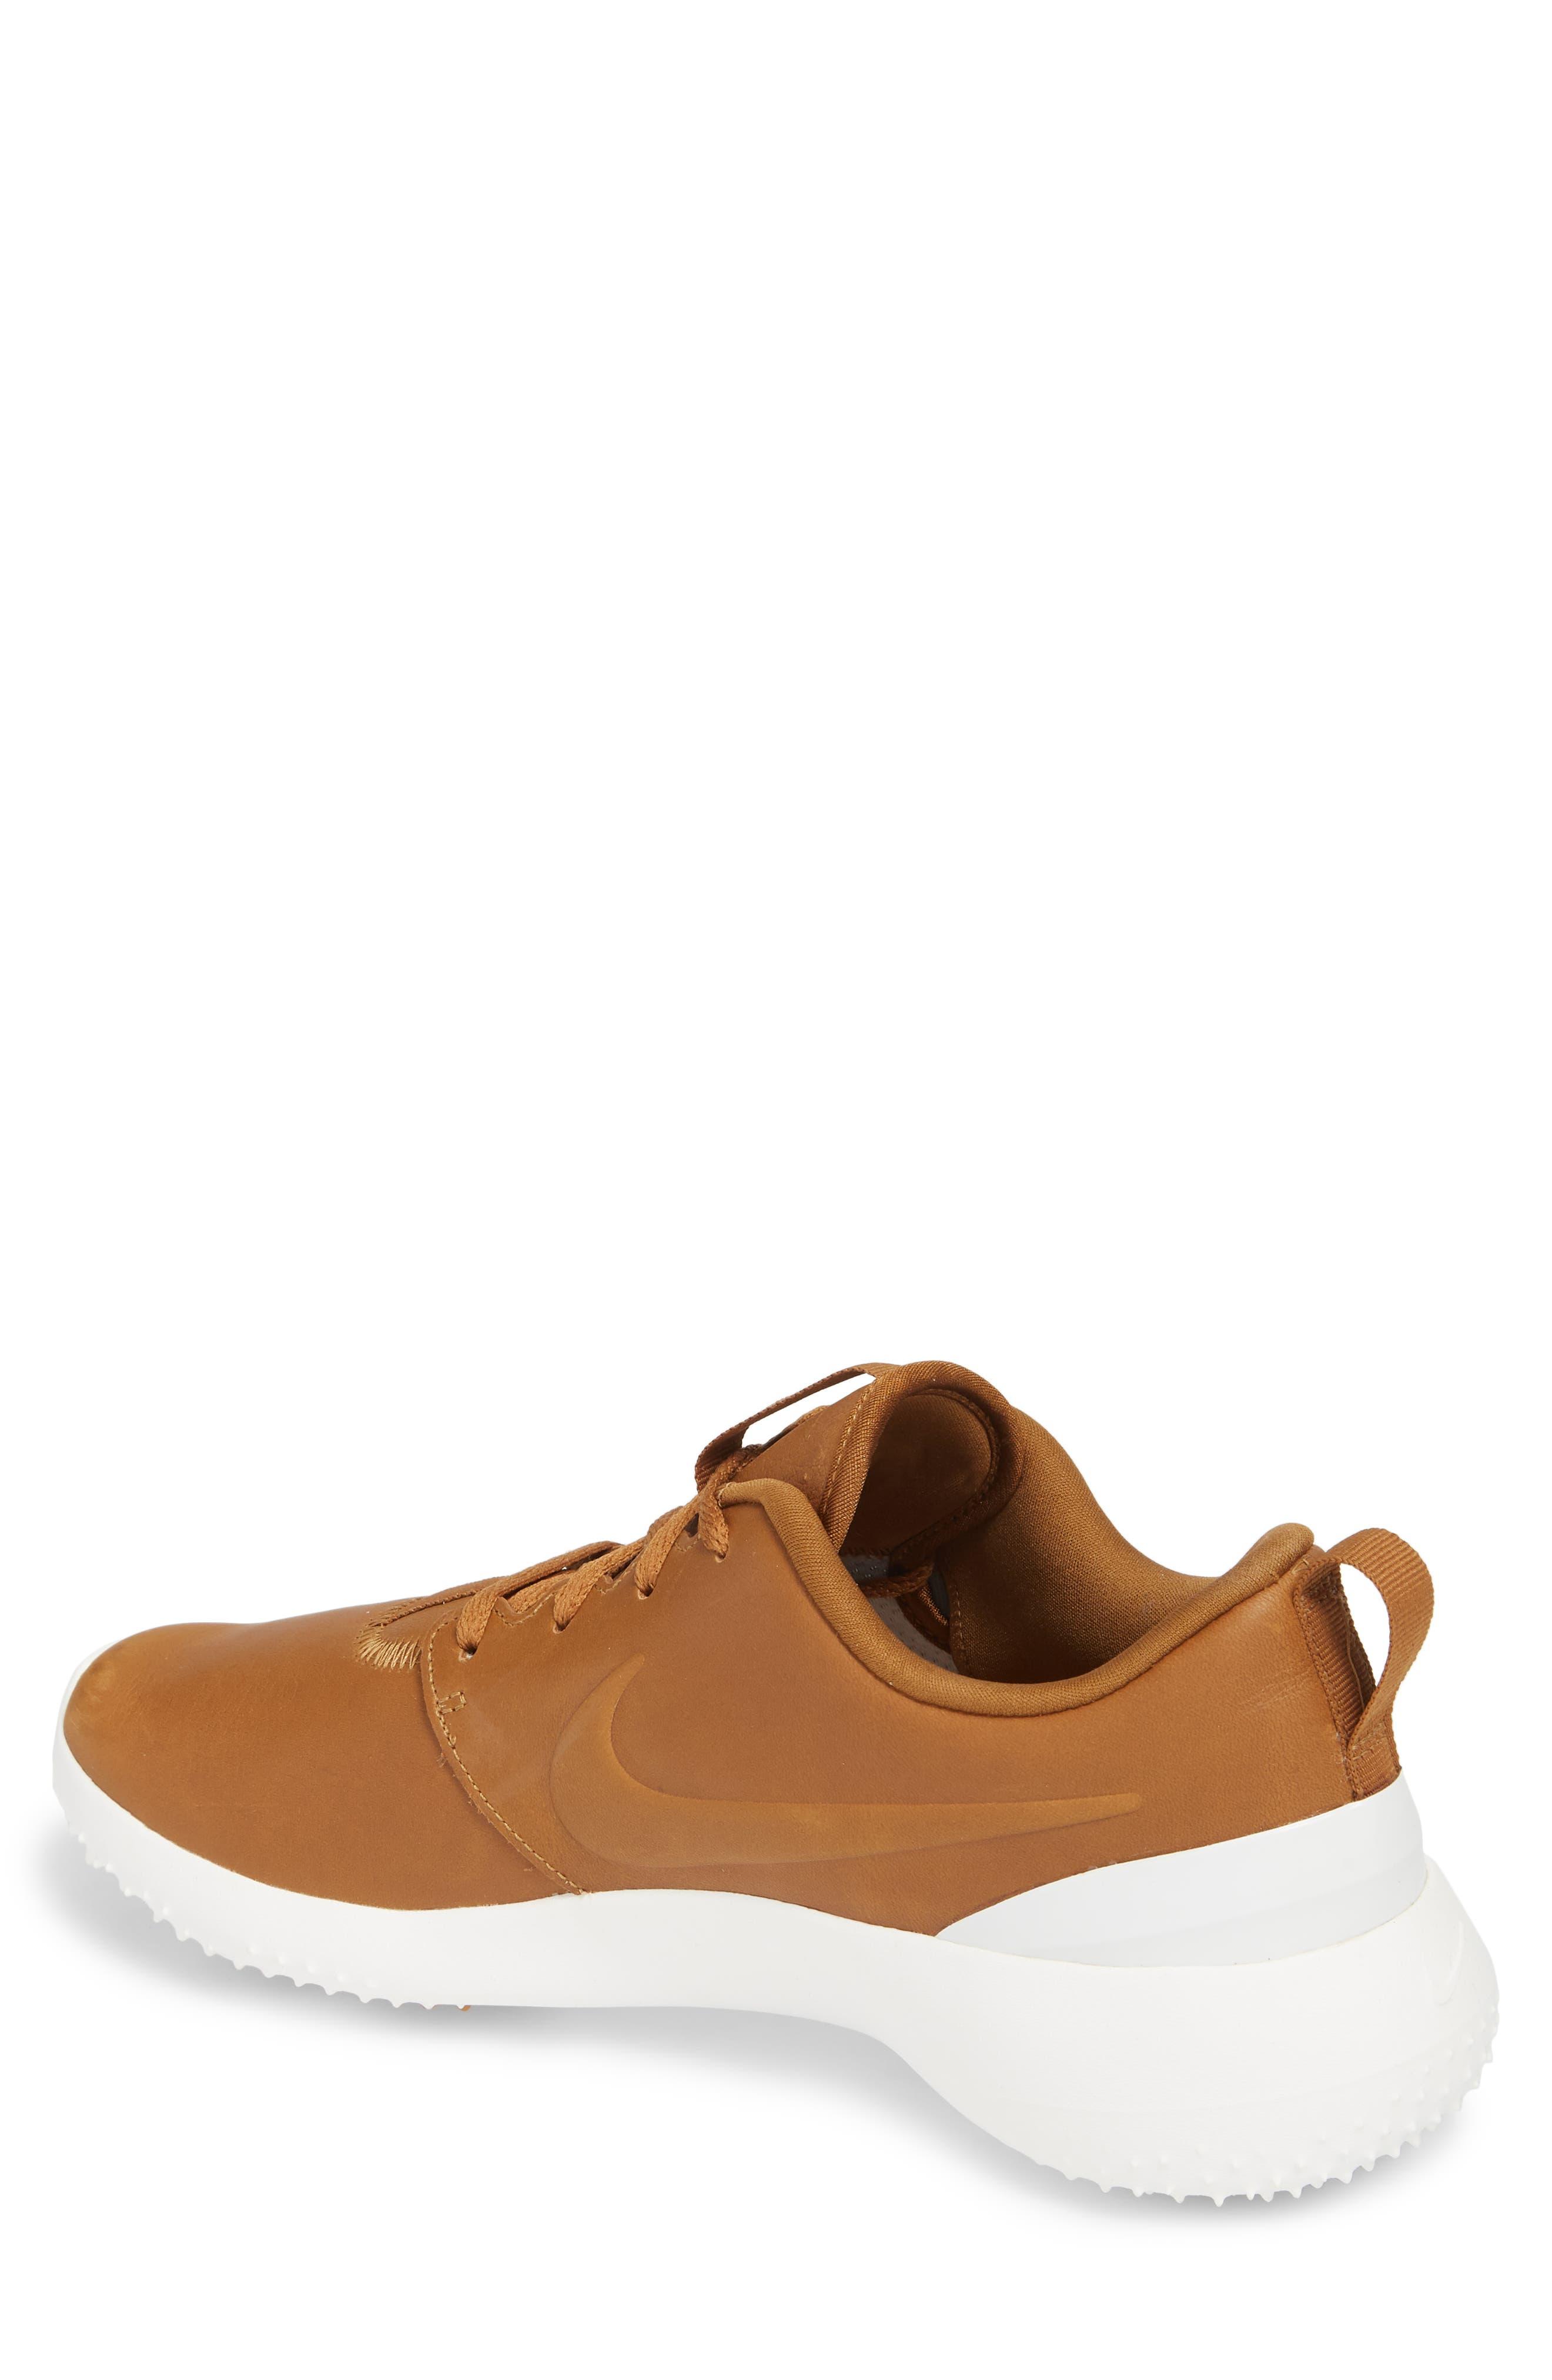 Roshe G Premium Golf Shoe,                             Alternate thumbnail 2, color,                             Ale Brown/ Ale Brown-White